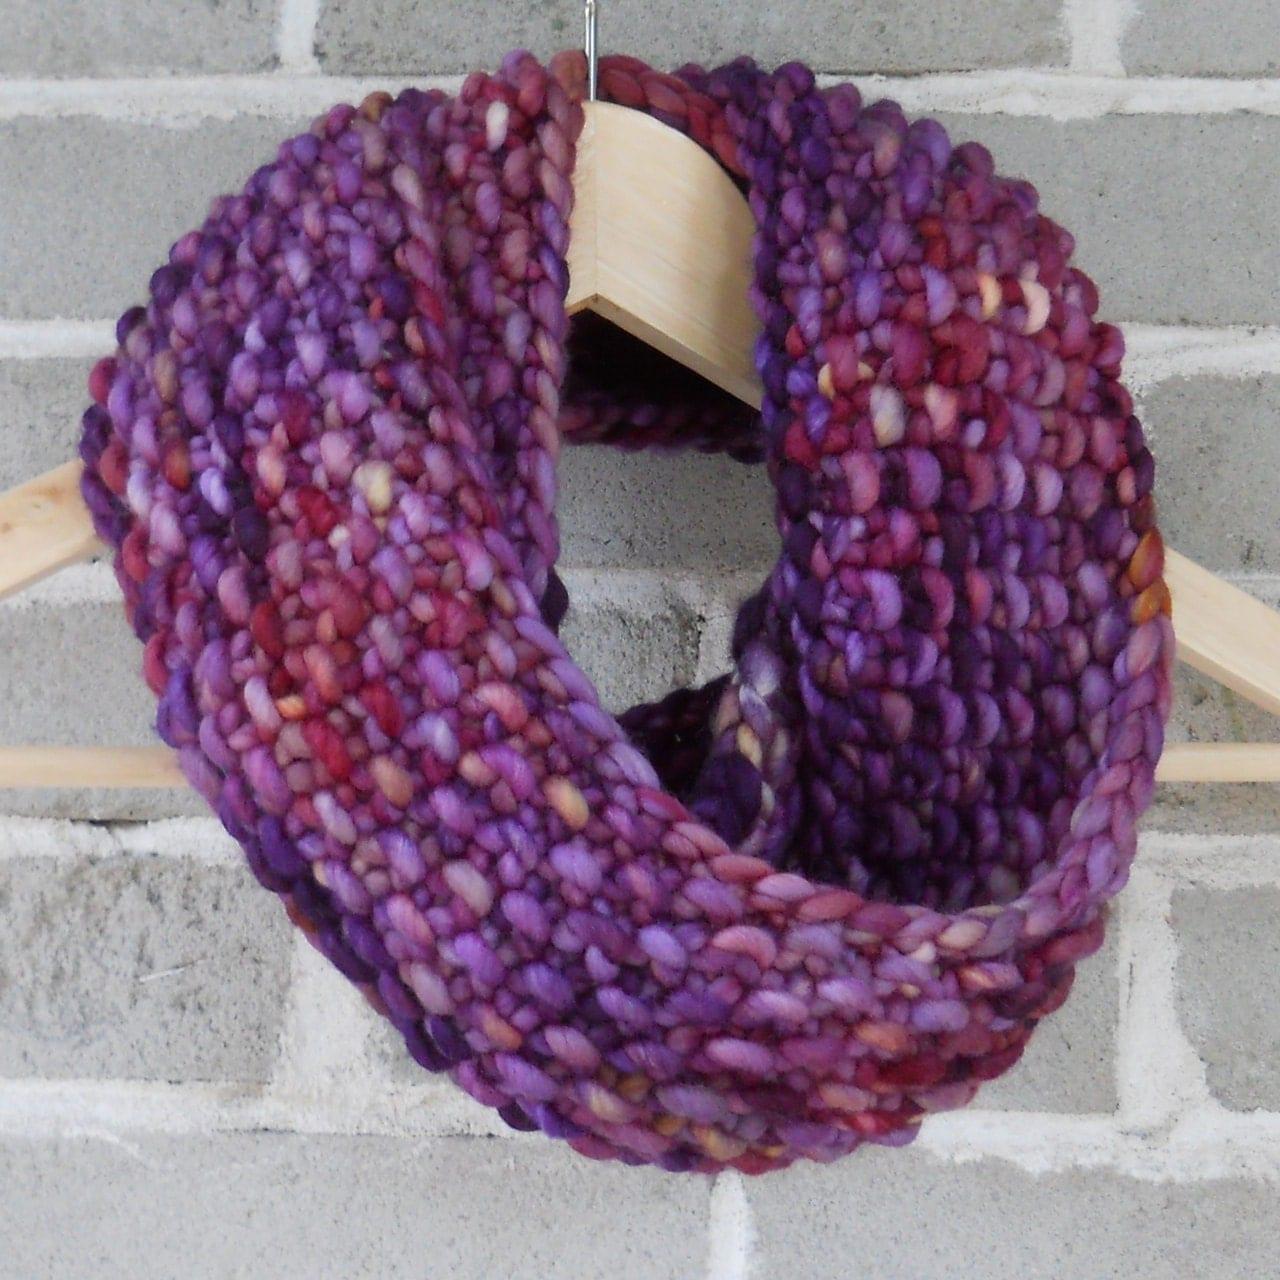 Twilight Purple Merino Wool Hand Knit Infinity Scarf - OopsIKnittedAgain